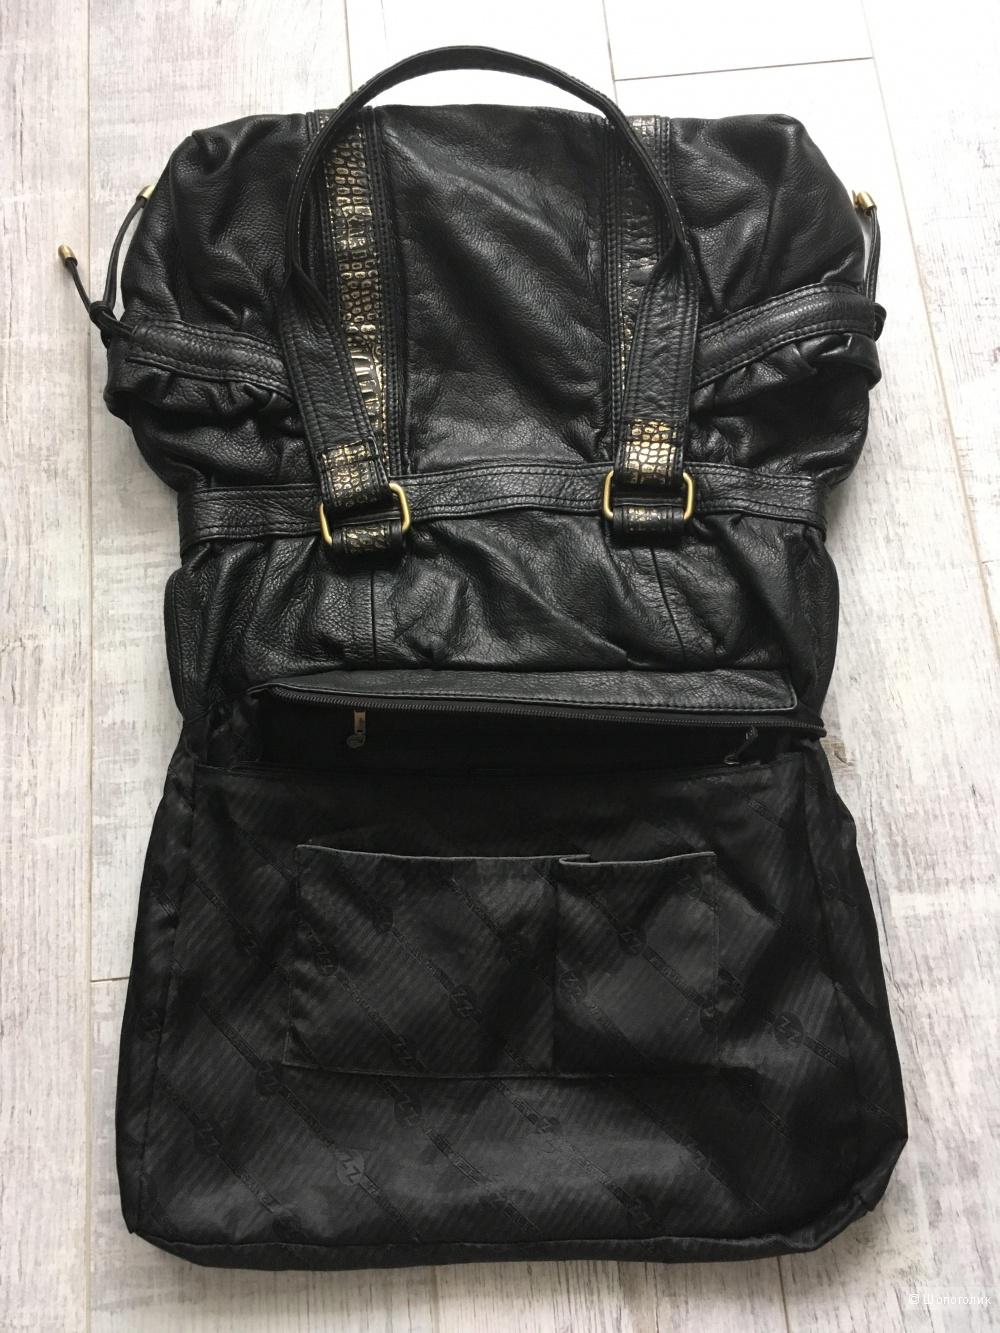 Сумка Eleganzza, размер 39 х 30 см